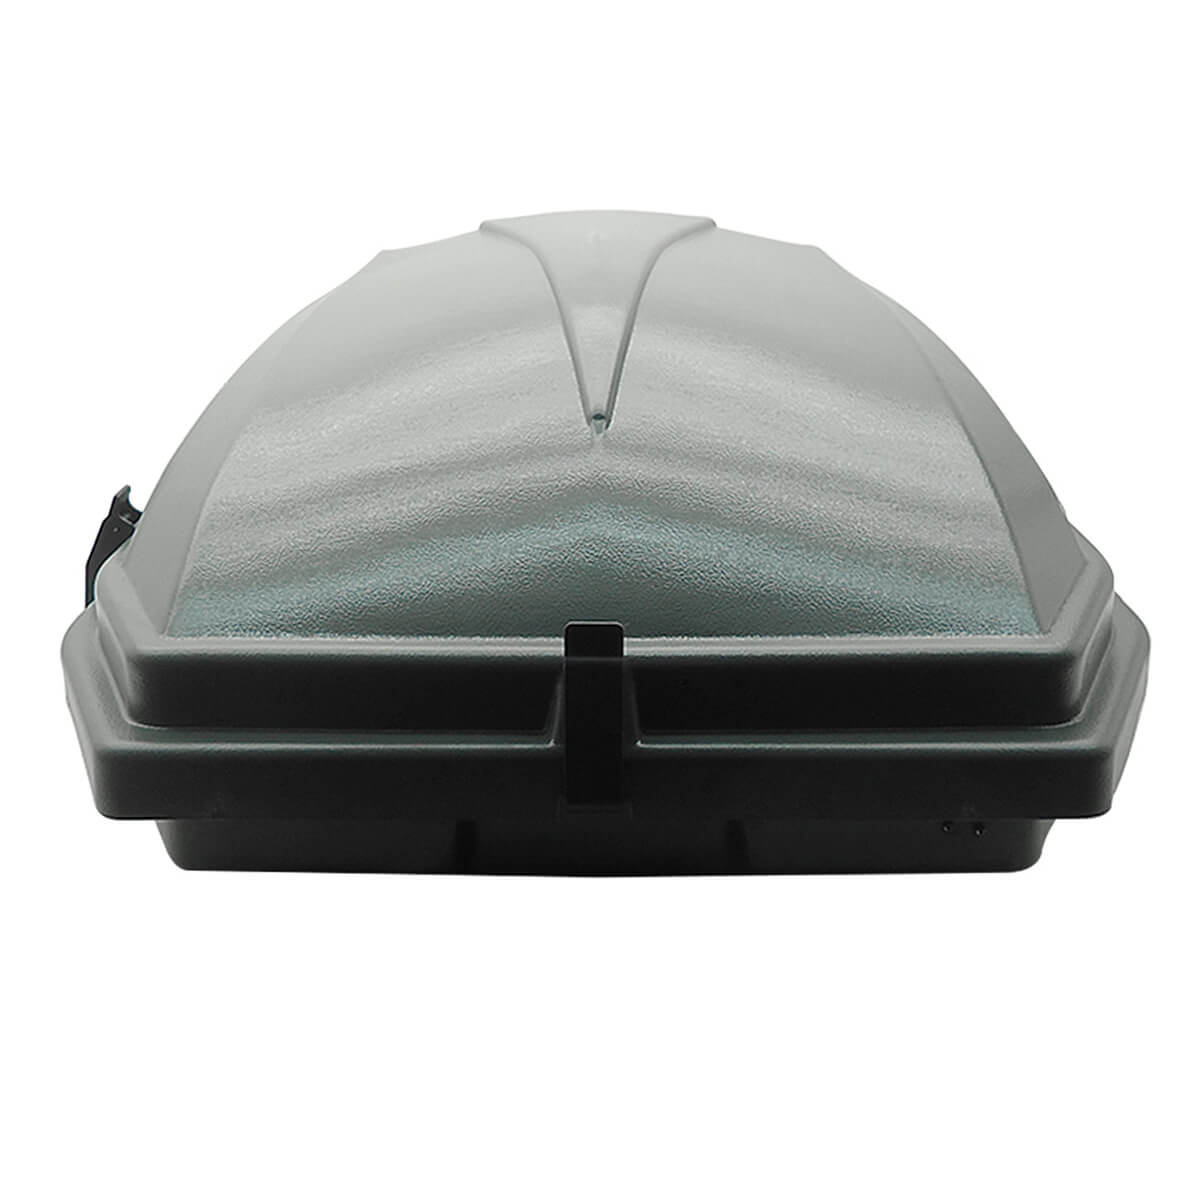 Bagageiro de teto maleiro com chave Motobul 270 litros cinza